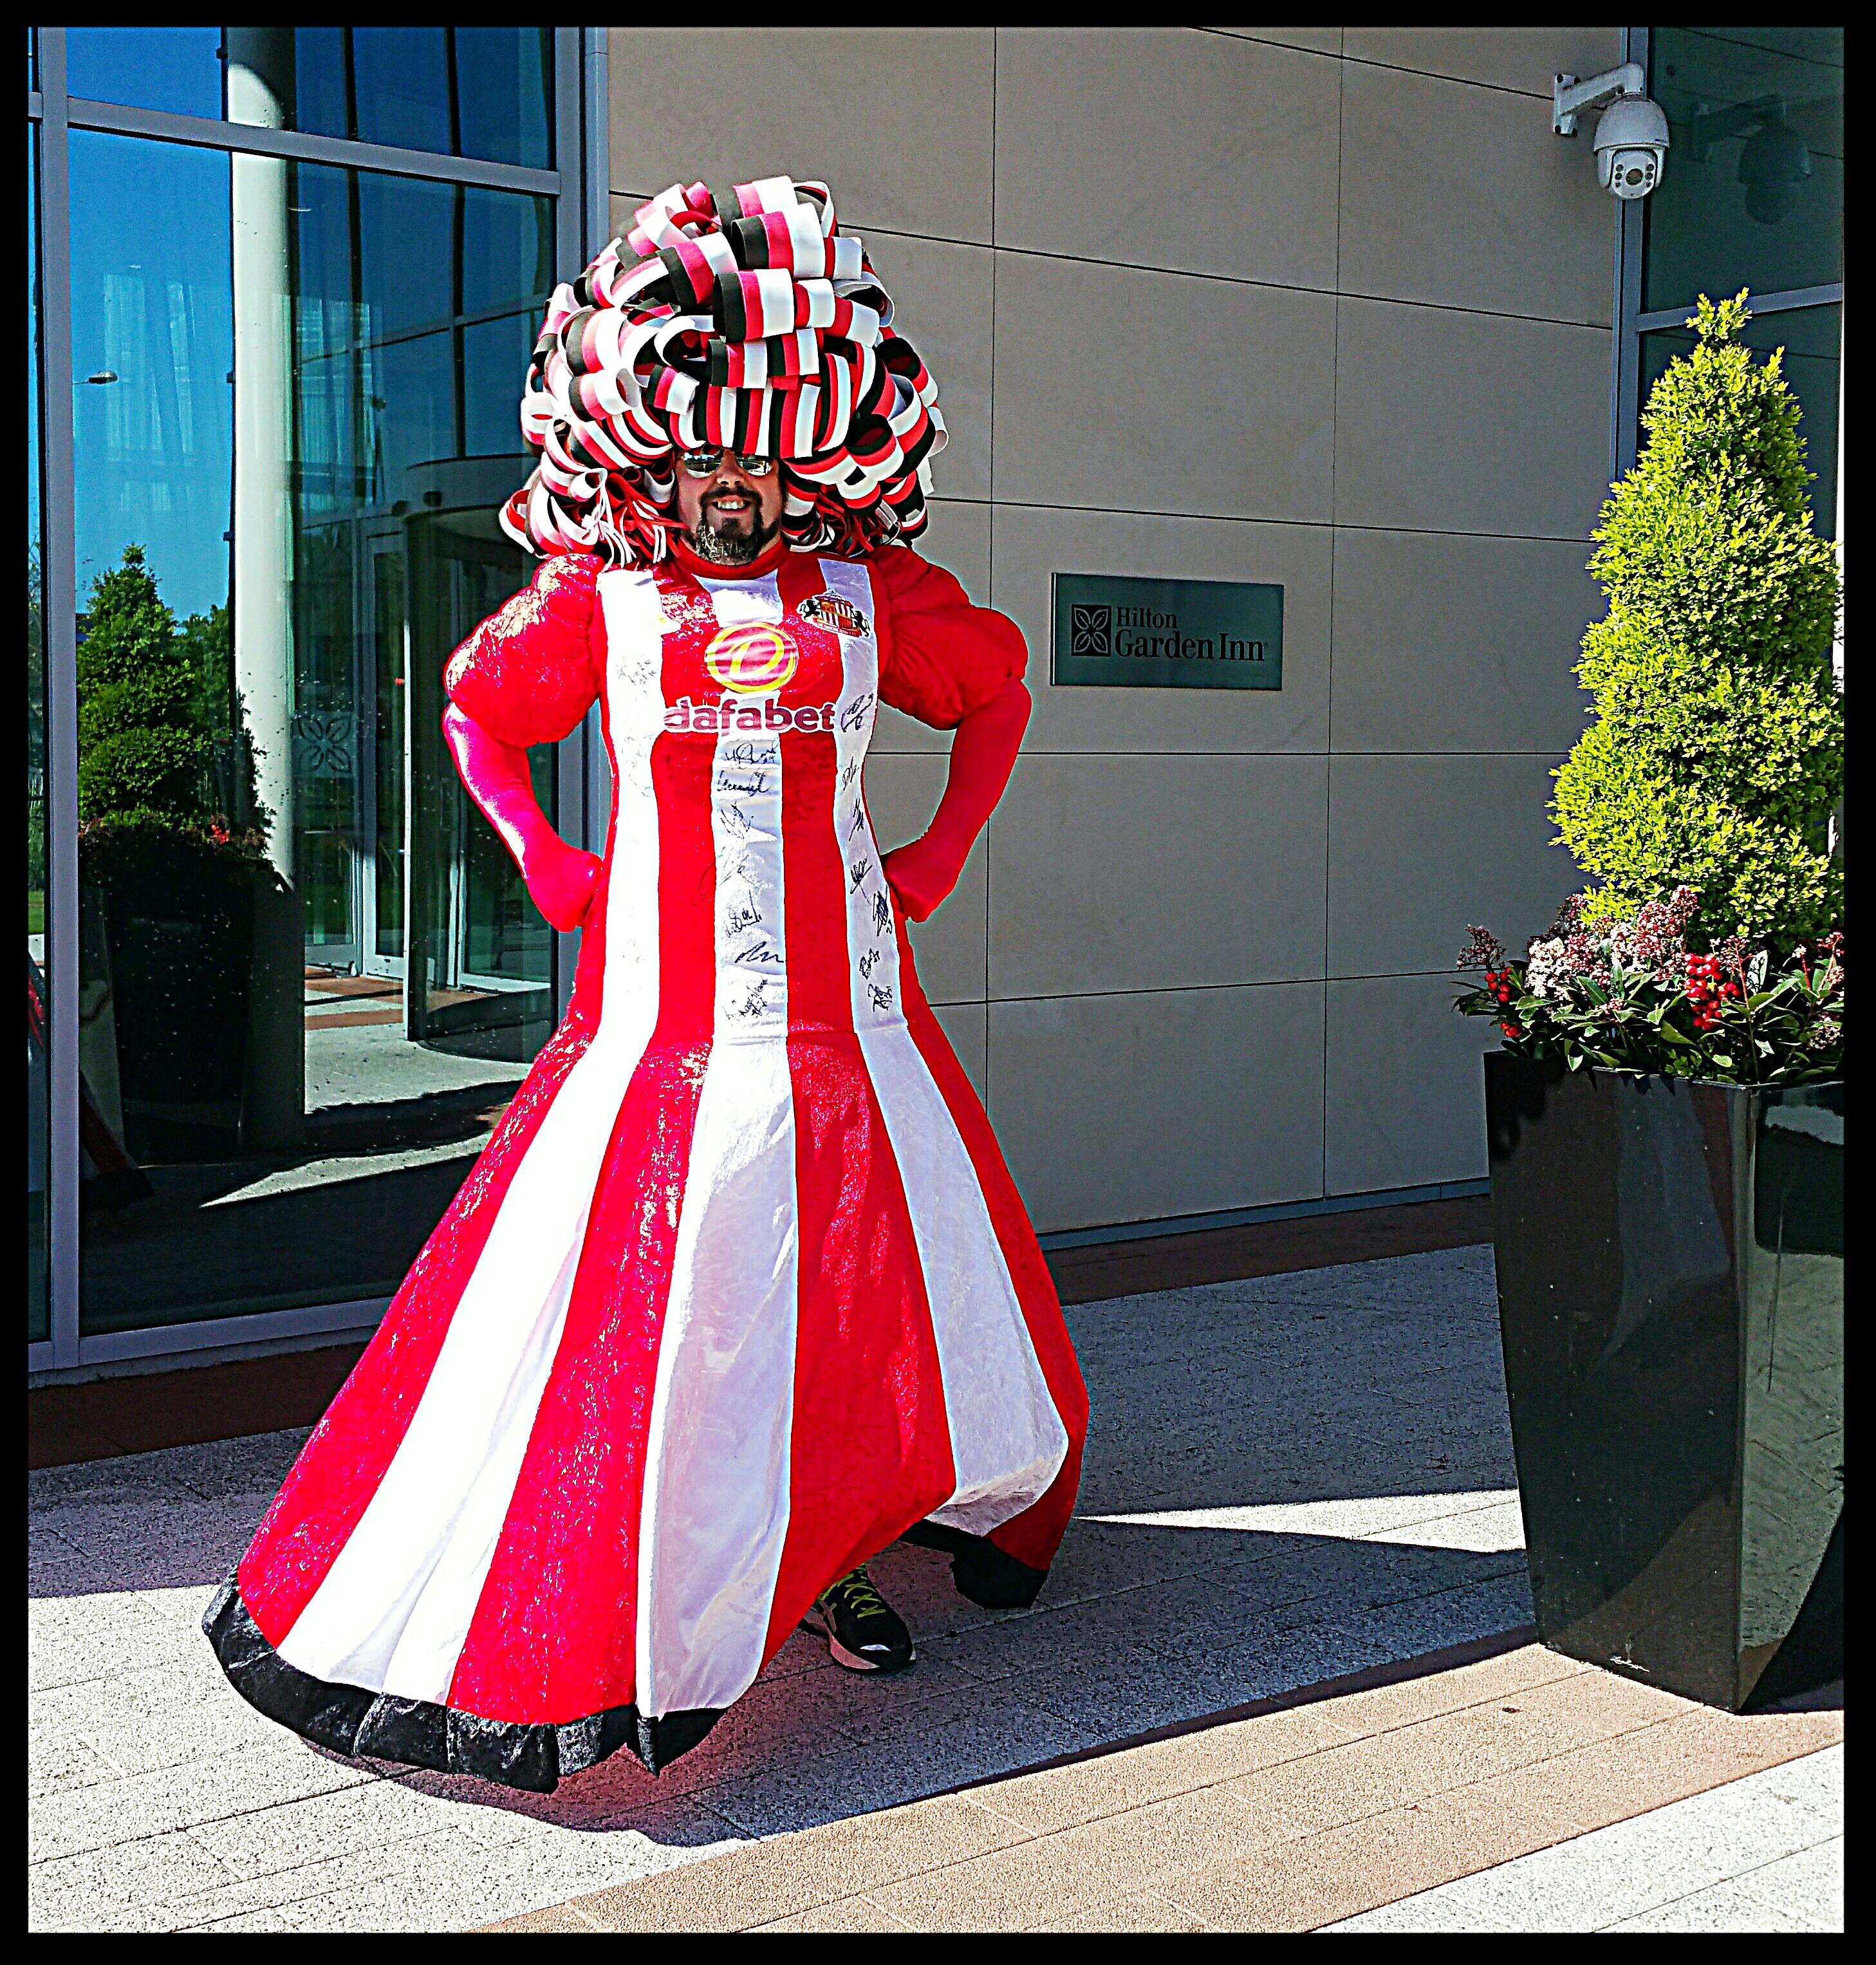 Big-Pink-Dress-THAT-Branding-Company-Sunderland-10km-2017-00138